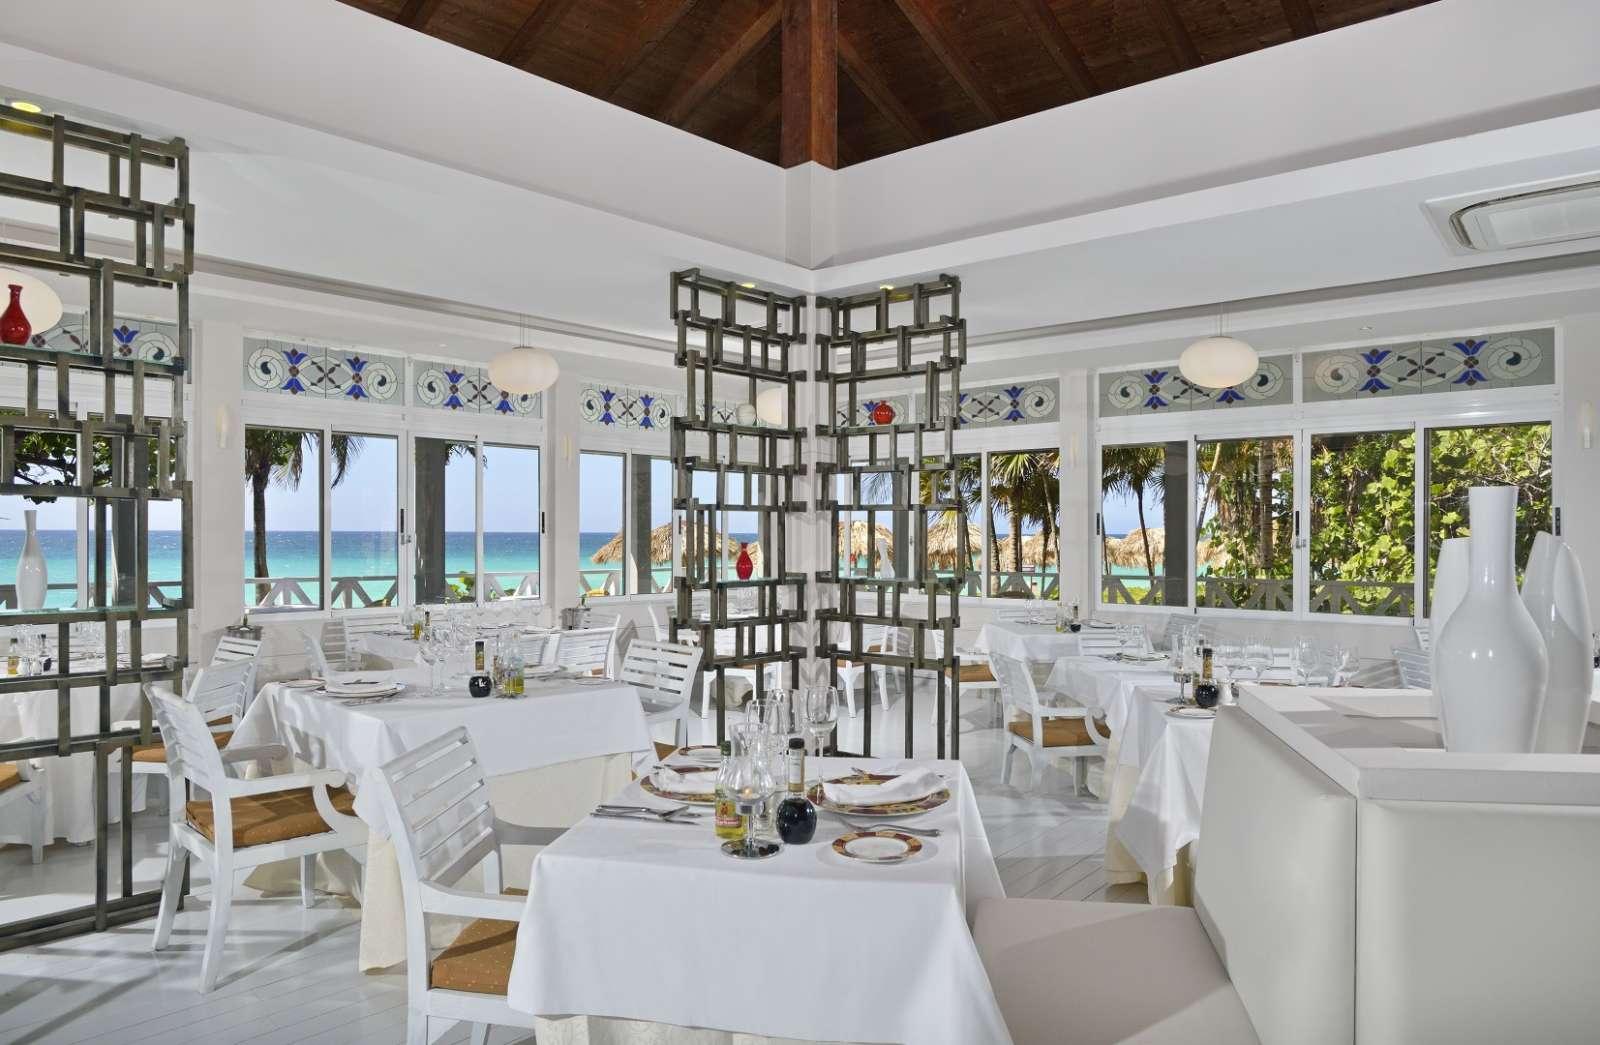 Mediterranean restaurant at Melia Las Americas